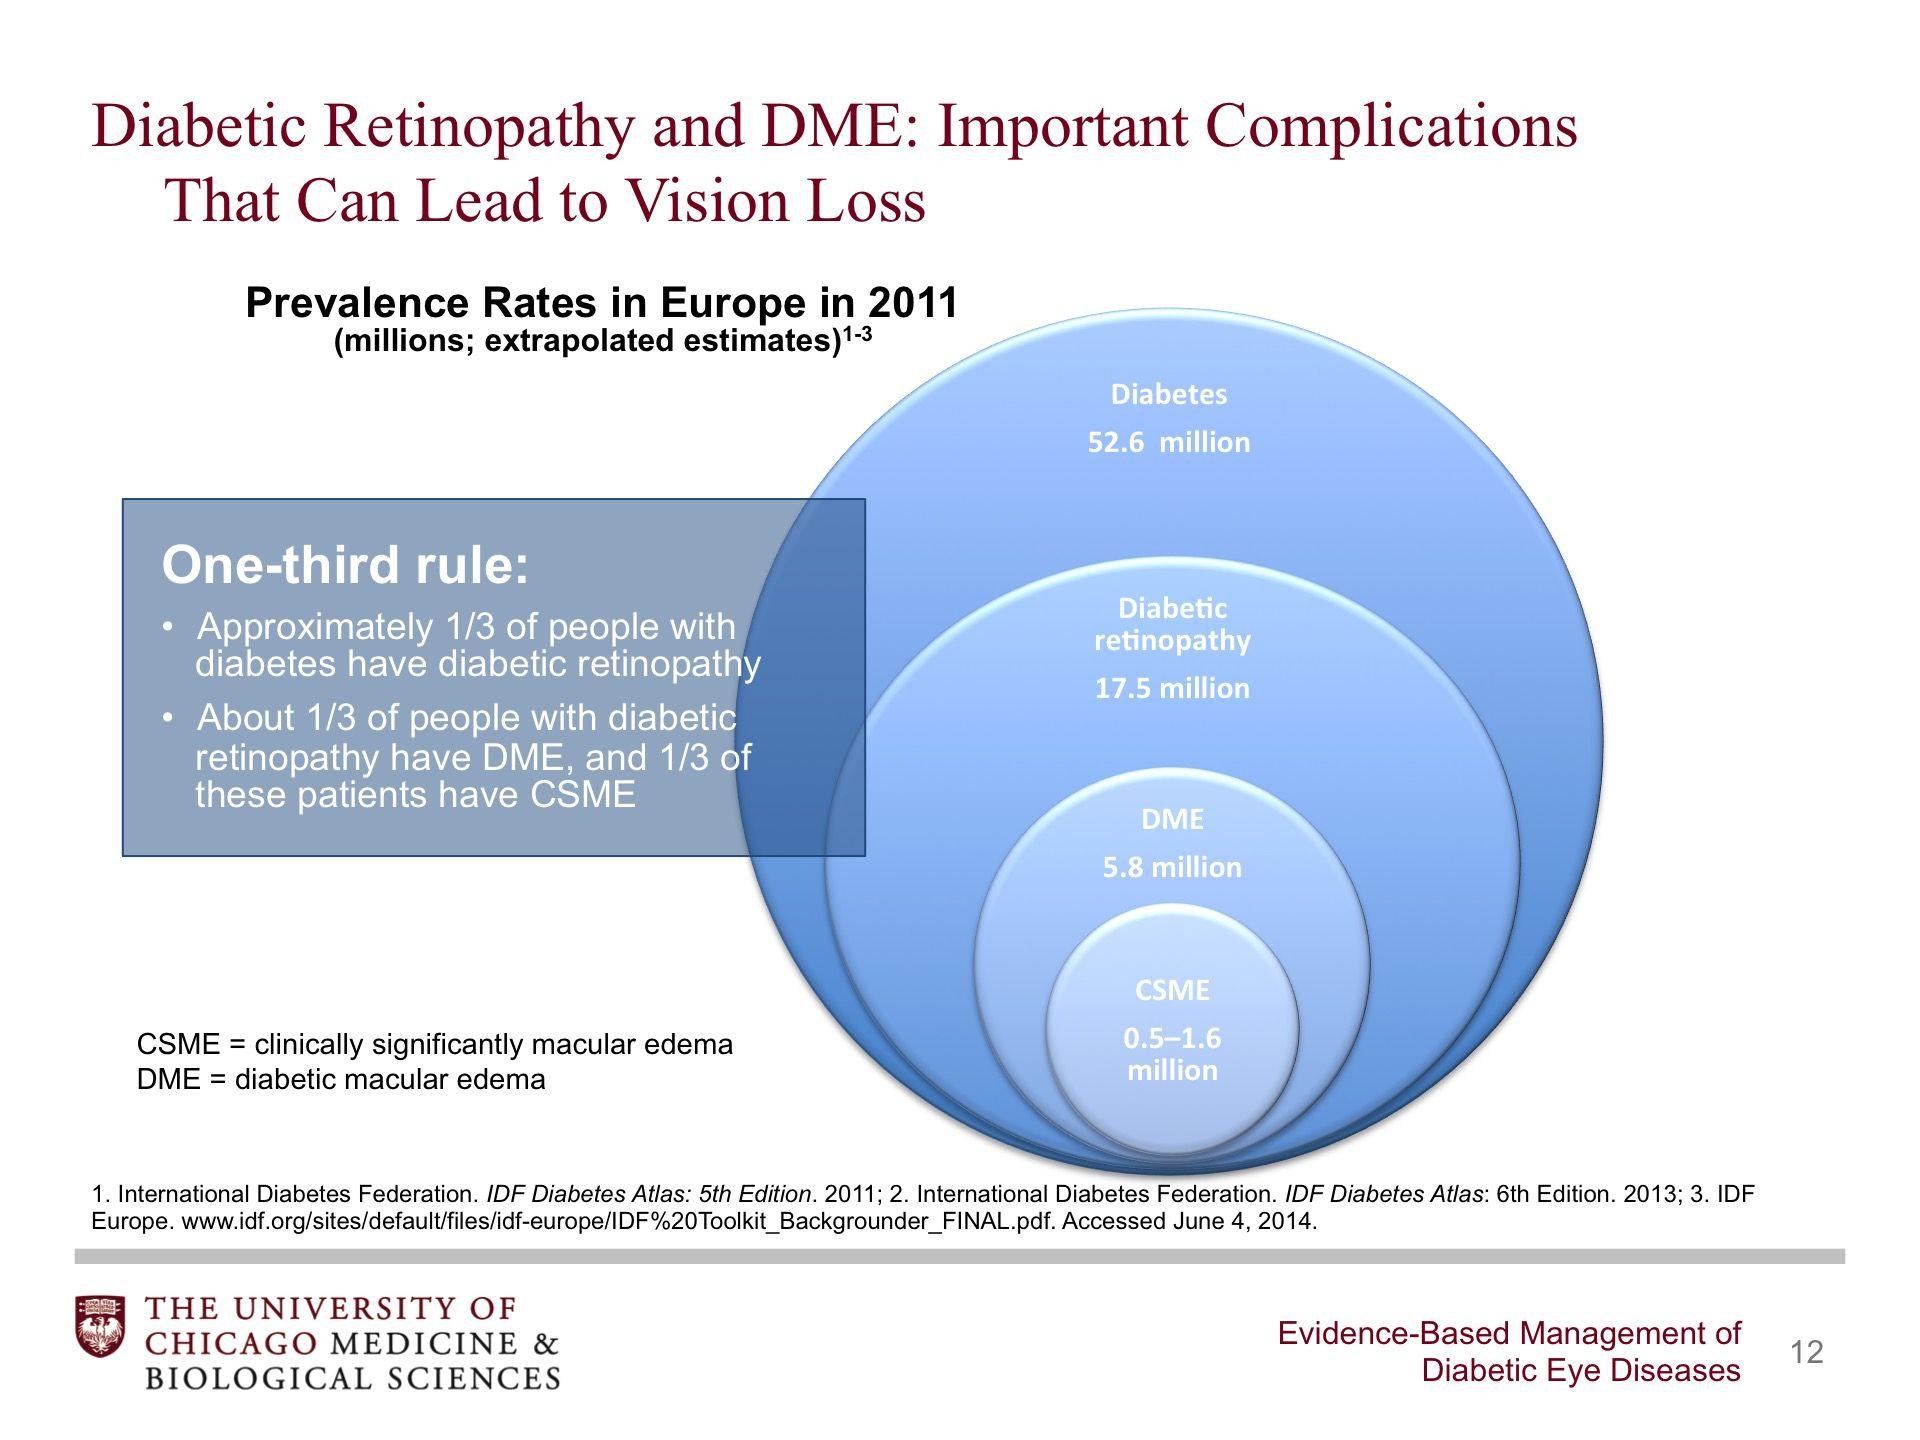 Evidence-Based Management of Diabetic Eye Diseases